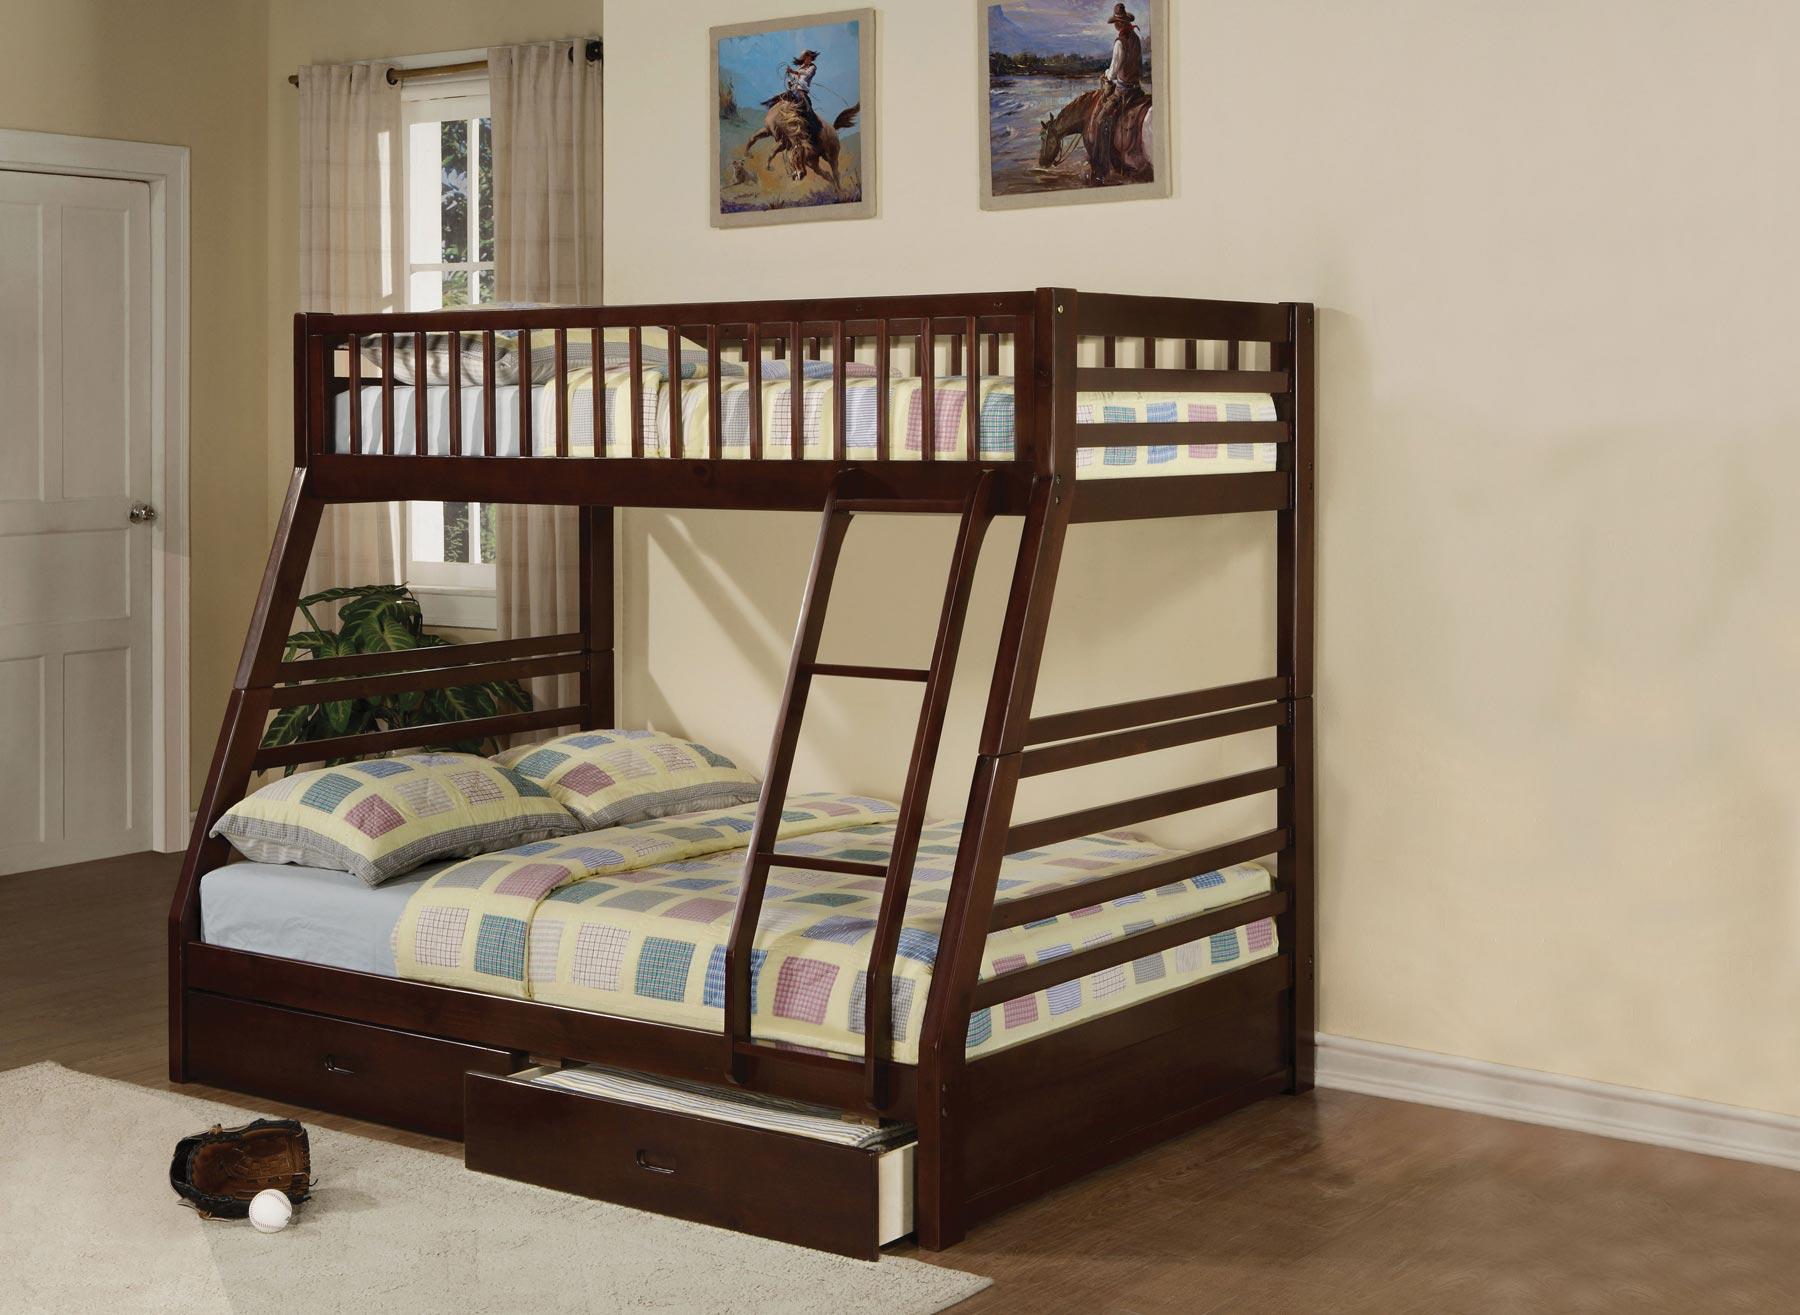 Jason Espresso Bunk Bed Gonzalez Furniture